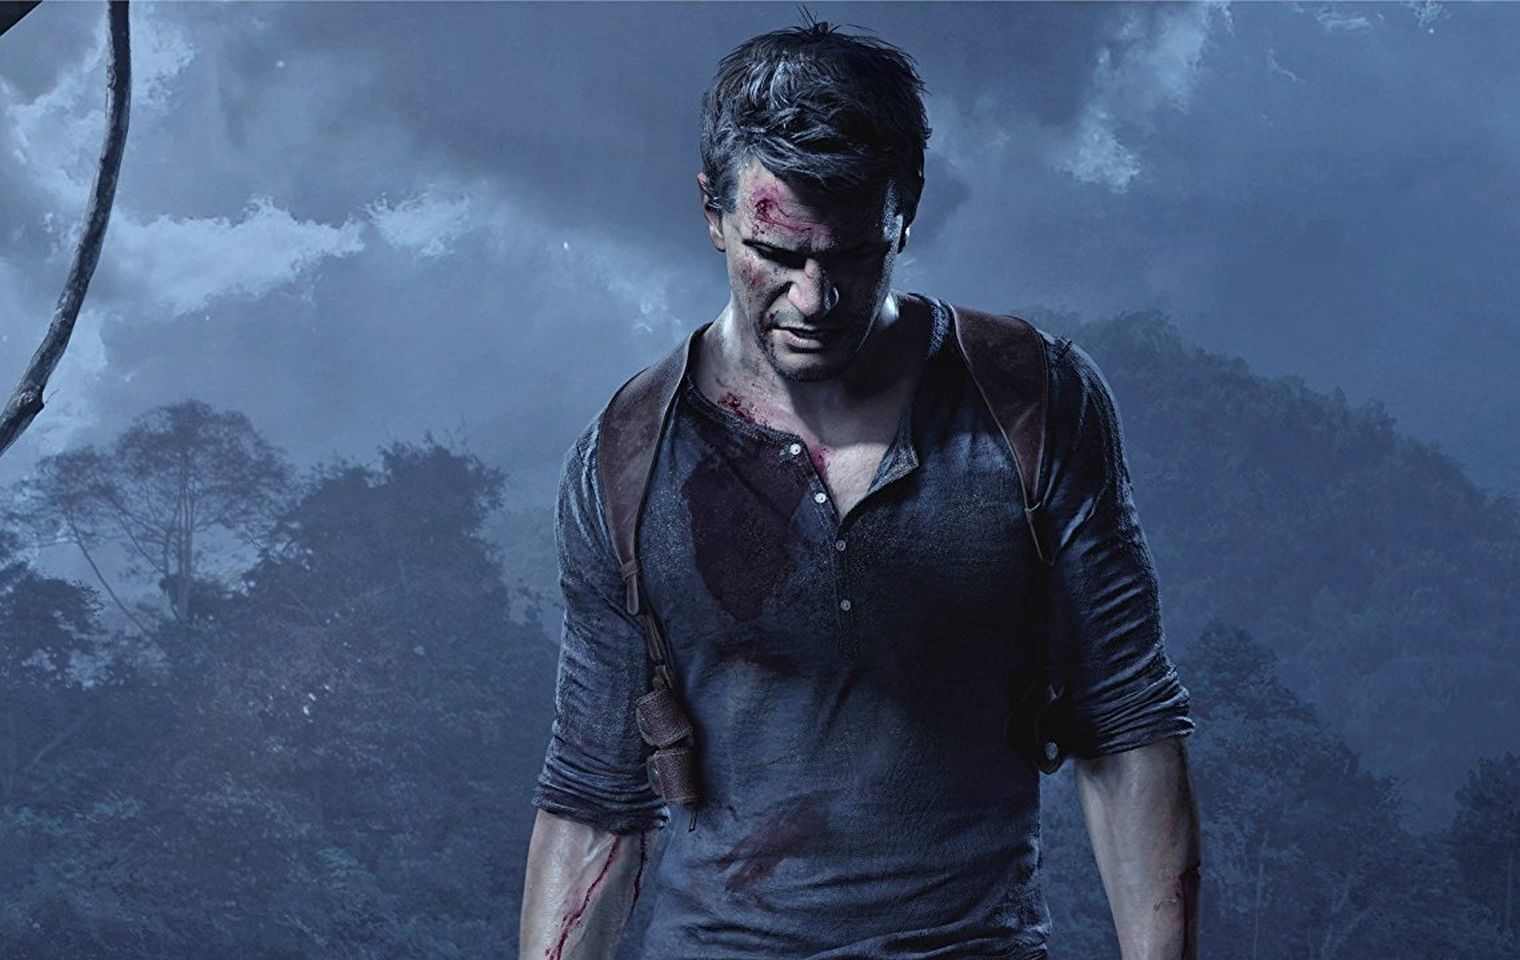 Uncharted: Erstes Bild von Tom Holland als Nathan Drake in Gaming-Verfilmung